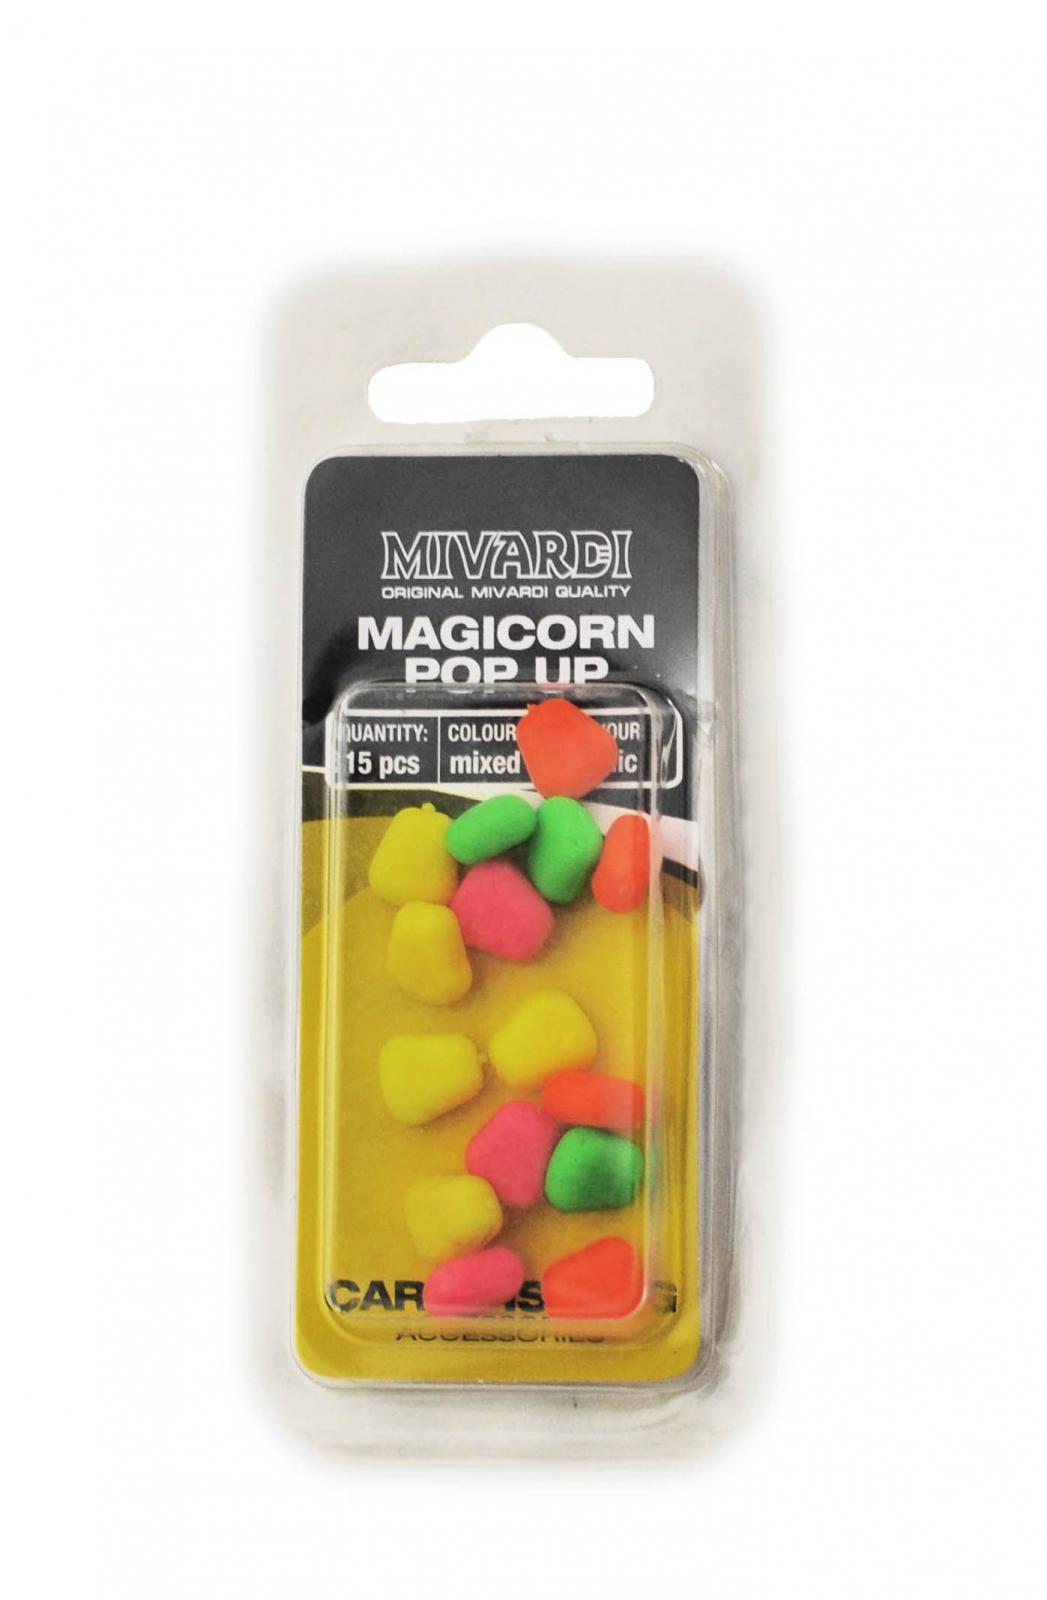 Mivardi Plovoucí kukuřice MagiCorn - Scopex